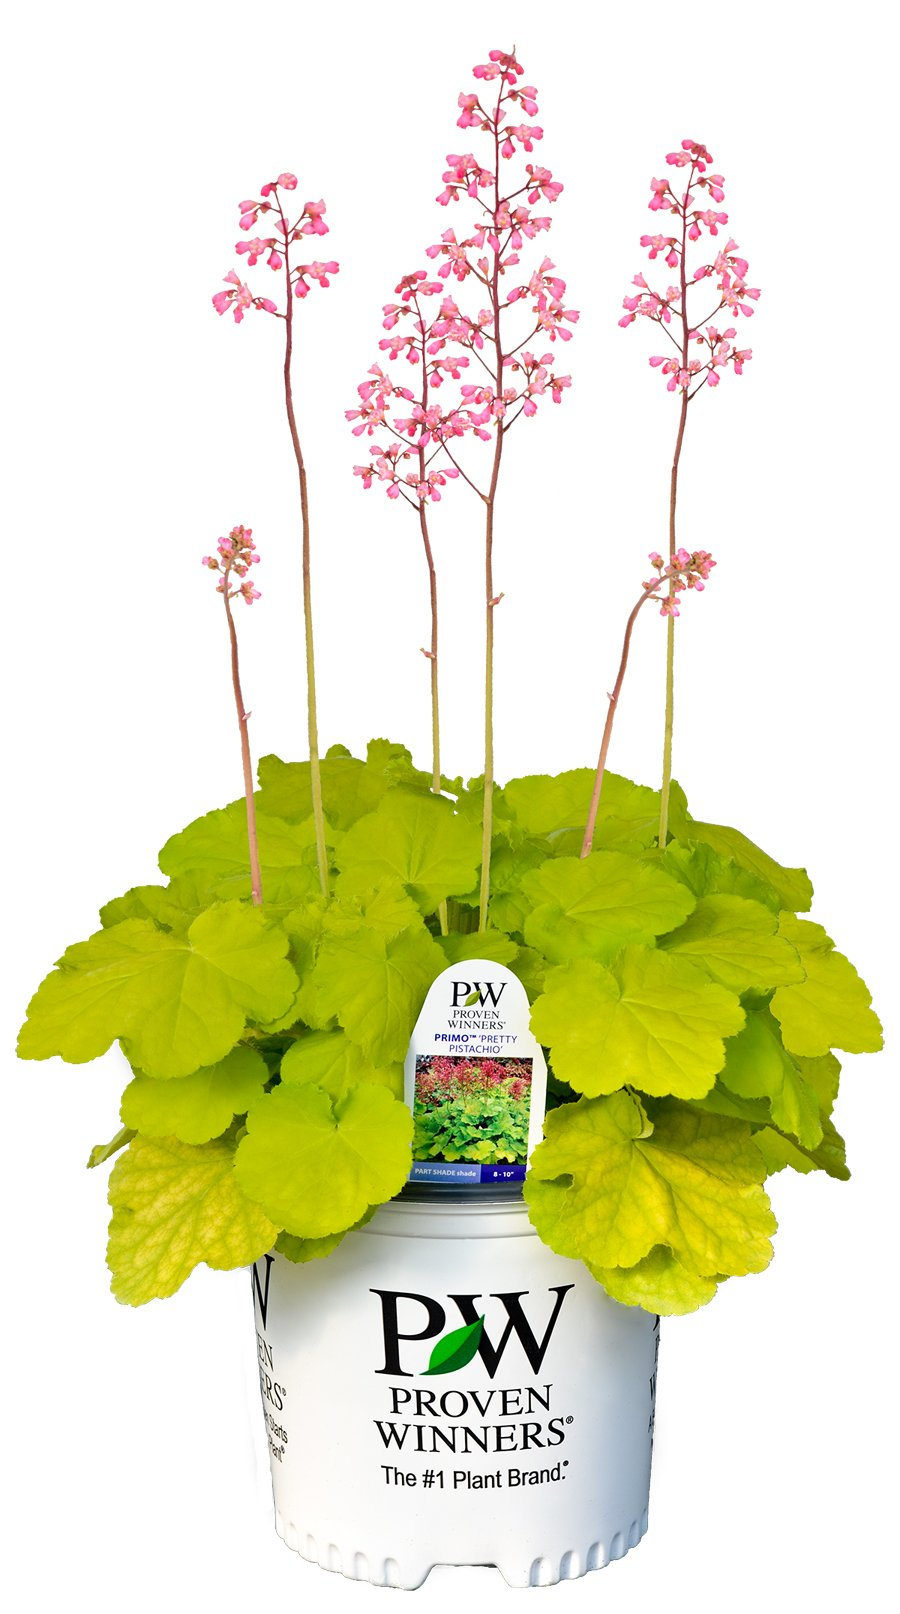 Primo Pretty Pistachio Coral Bells (Heuchera) Live Plant, Green Foliageand Pink Flowers, 0.65 Gallon